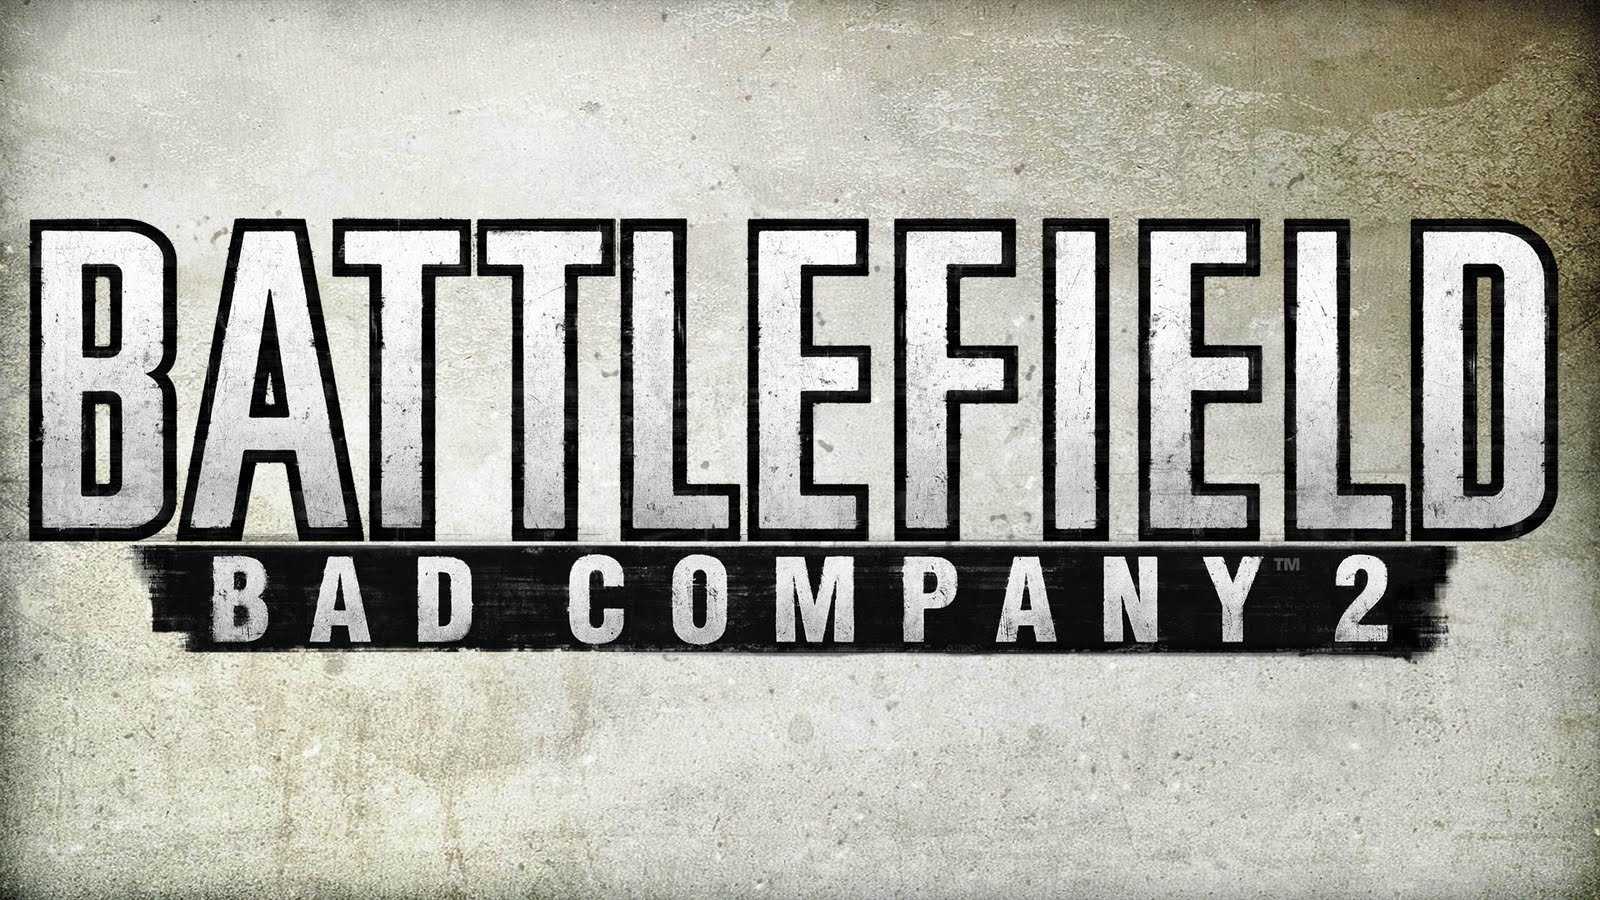 http://gam3rha.persiangig.com/image/Battlefield/Battlefield%20Bad%20Company%202%20HD%20wallpaper1.jpg